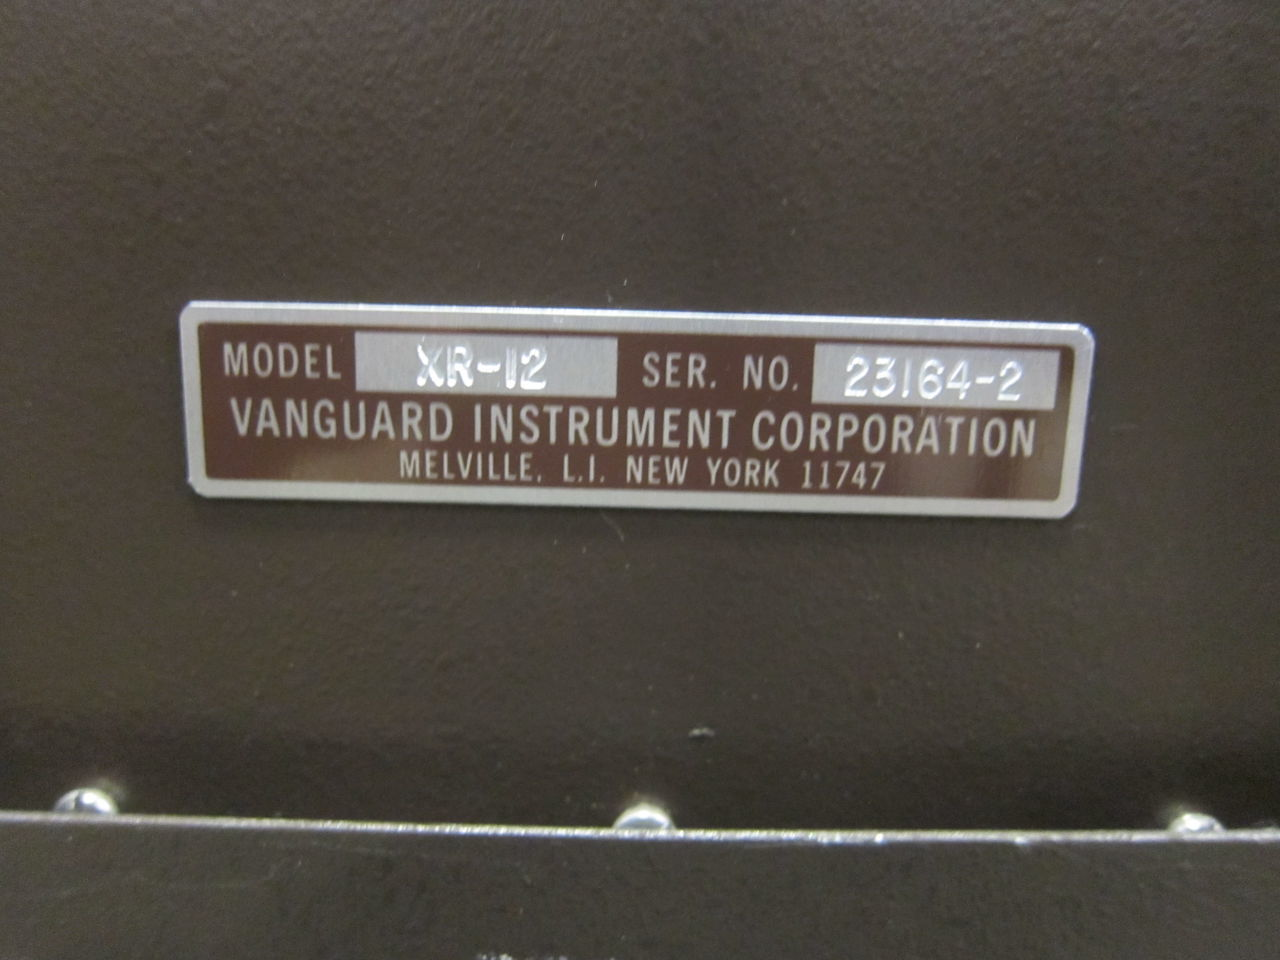 VANGUARD INSTRUMENTS CORP XR-35 Film Processor for sale